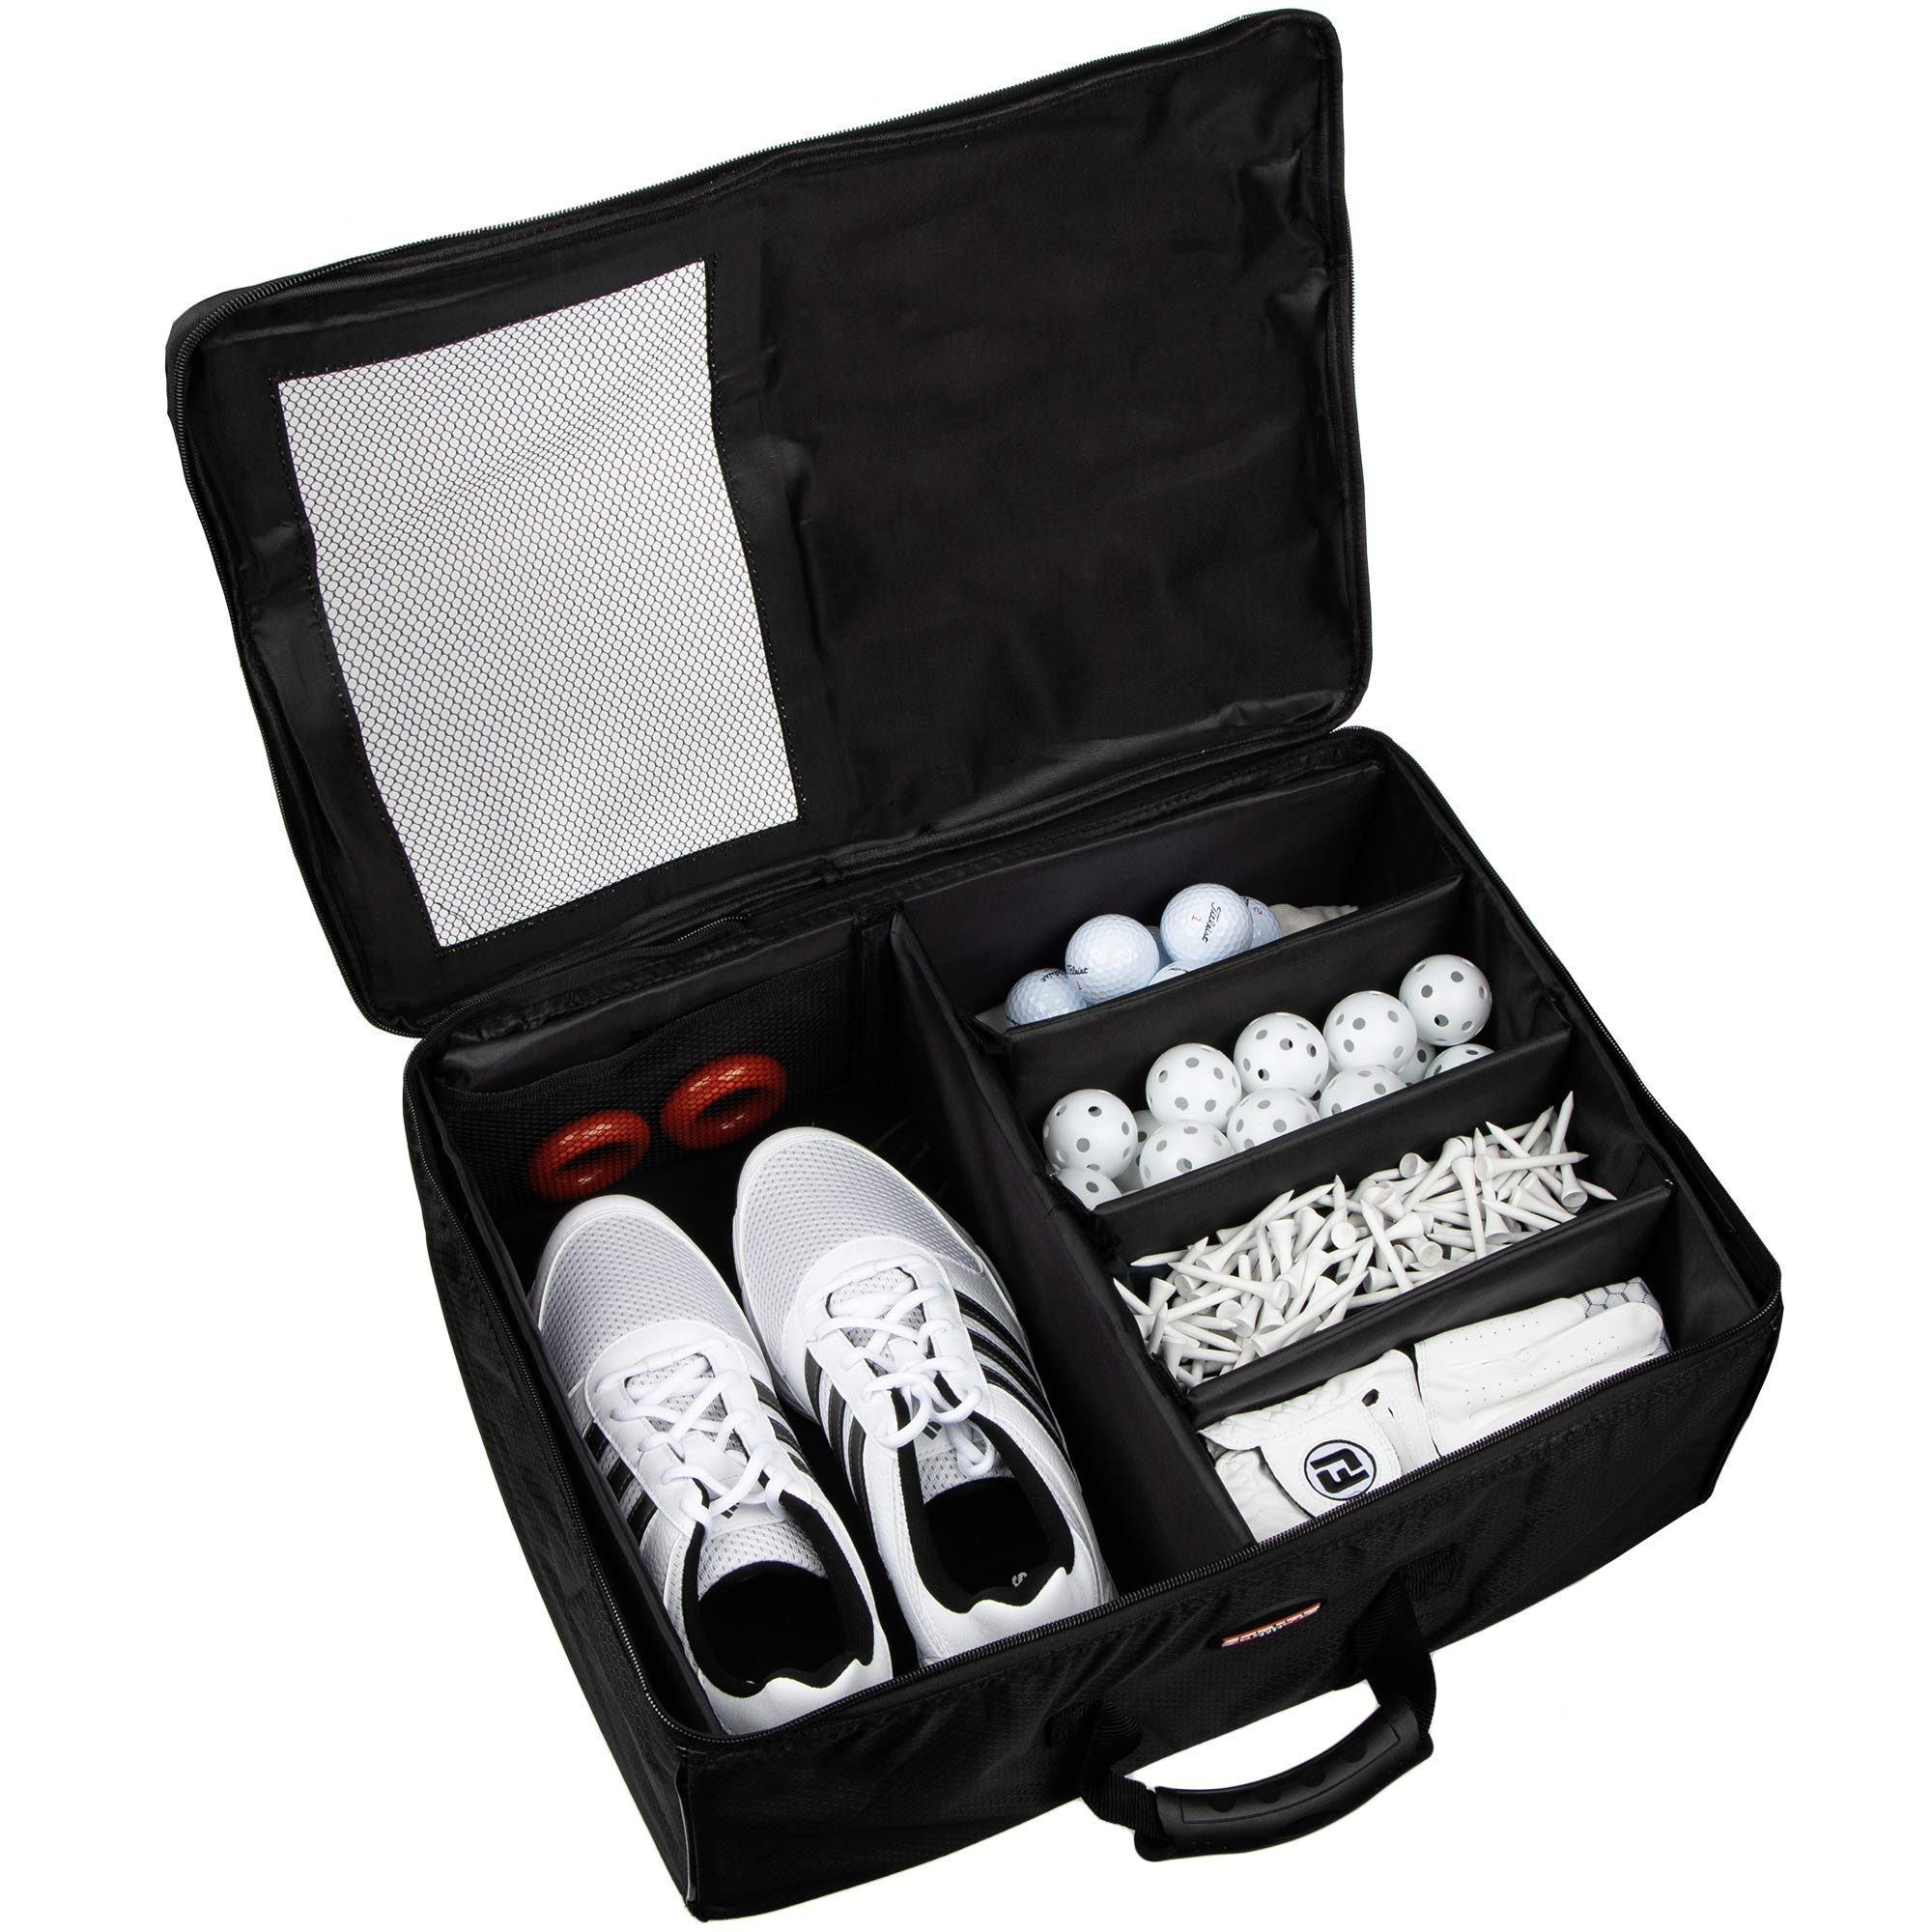 Stripe Golf Trunk Organizer and Travel Storage Locker by Stripe Golf